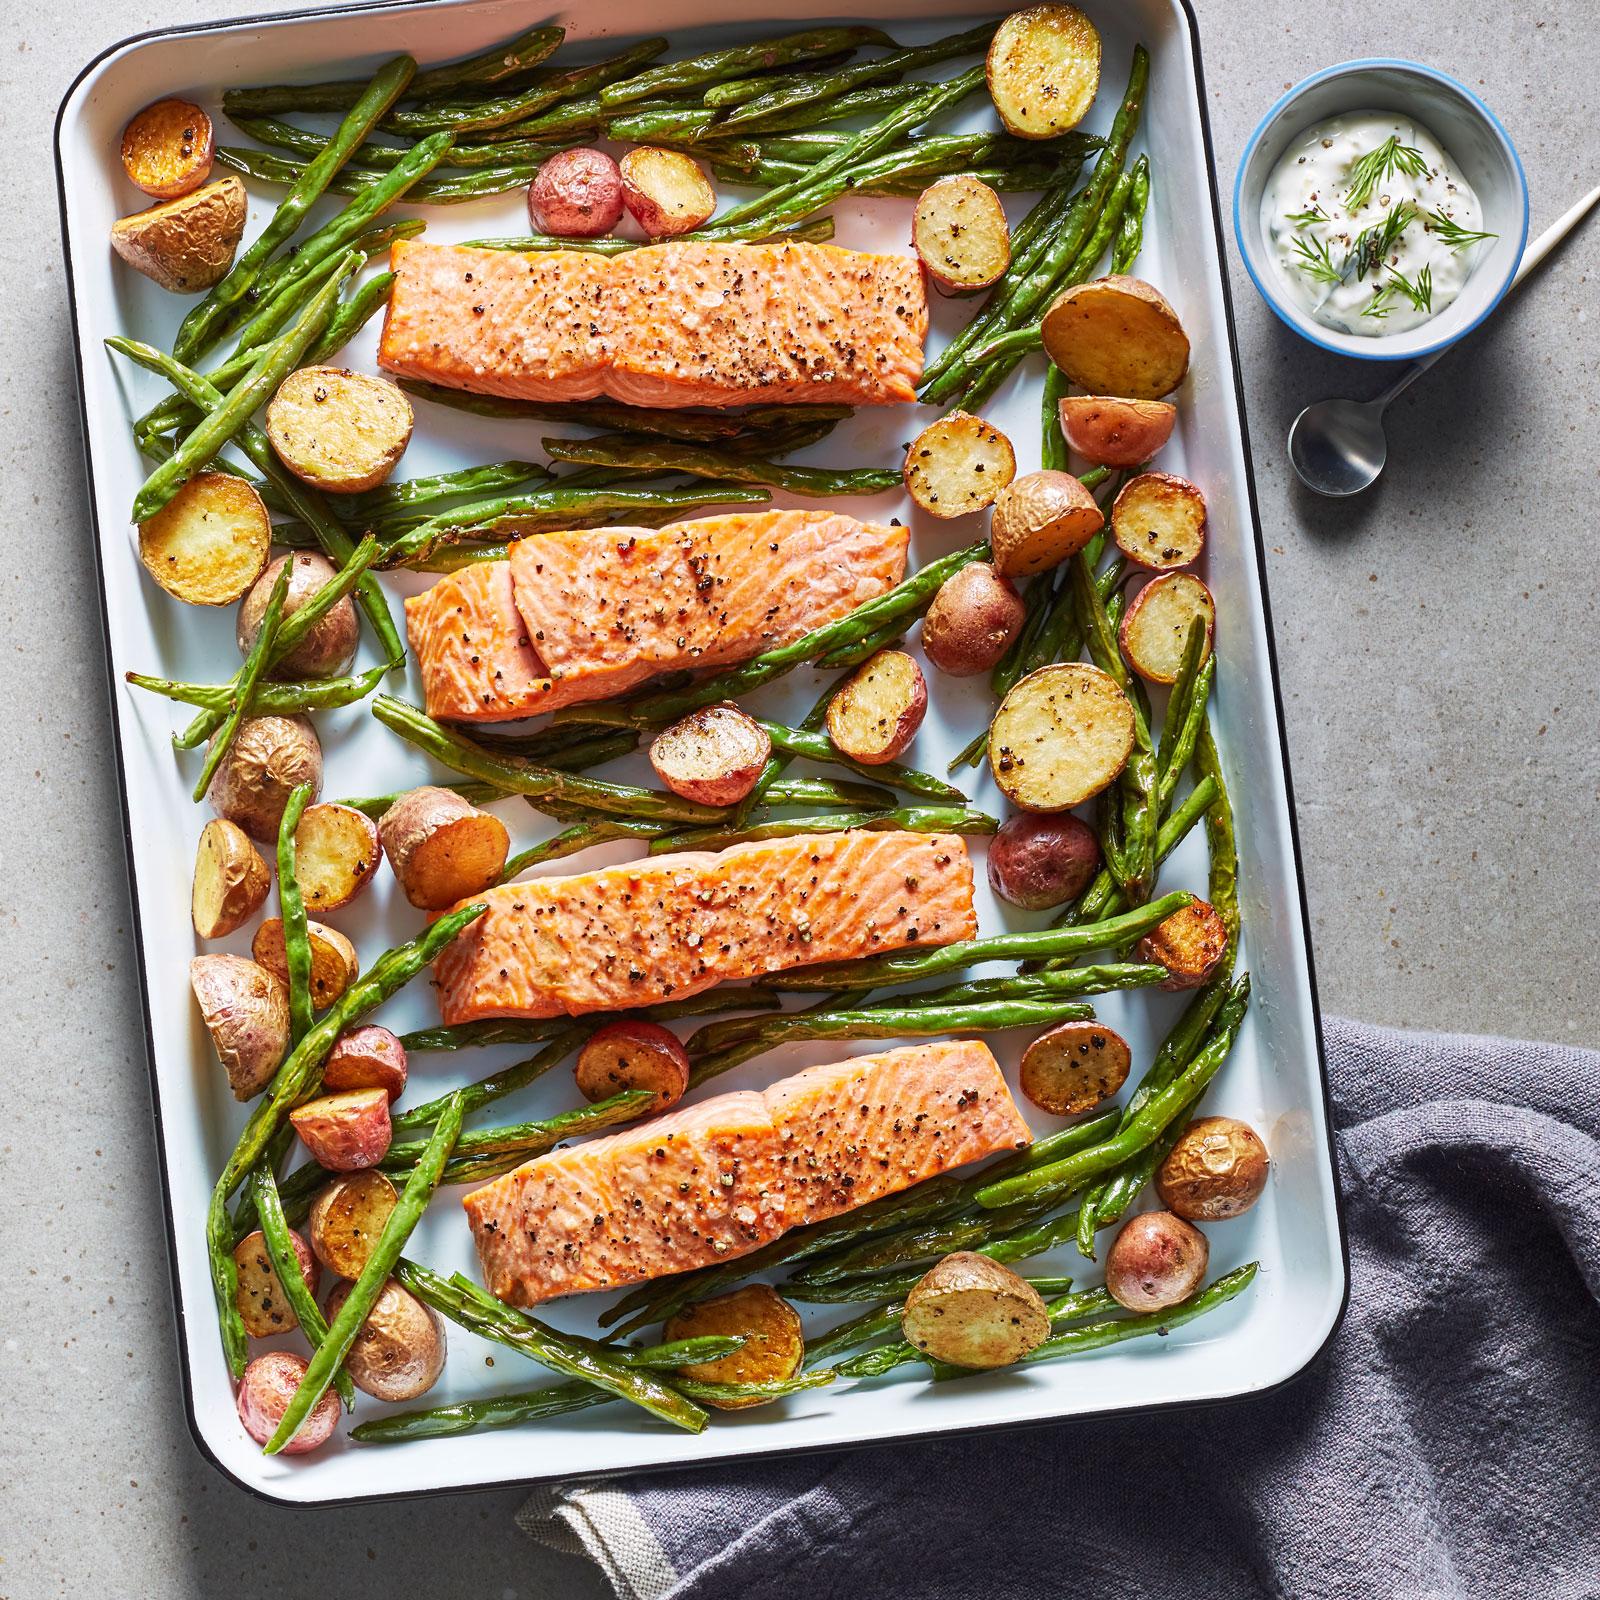 Sheet Pan Salmon, Green Beans, andPotatoes